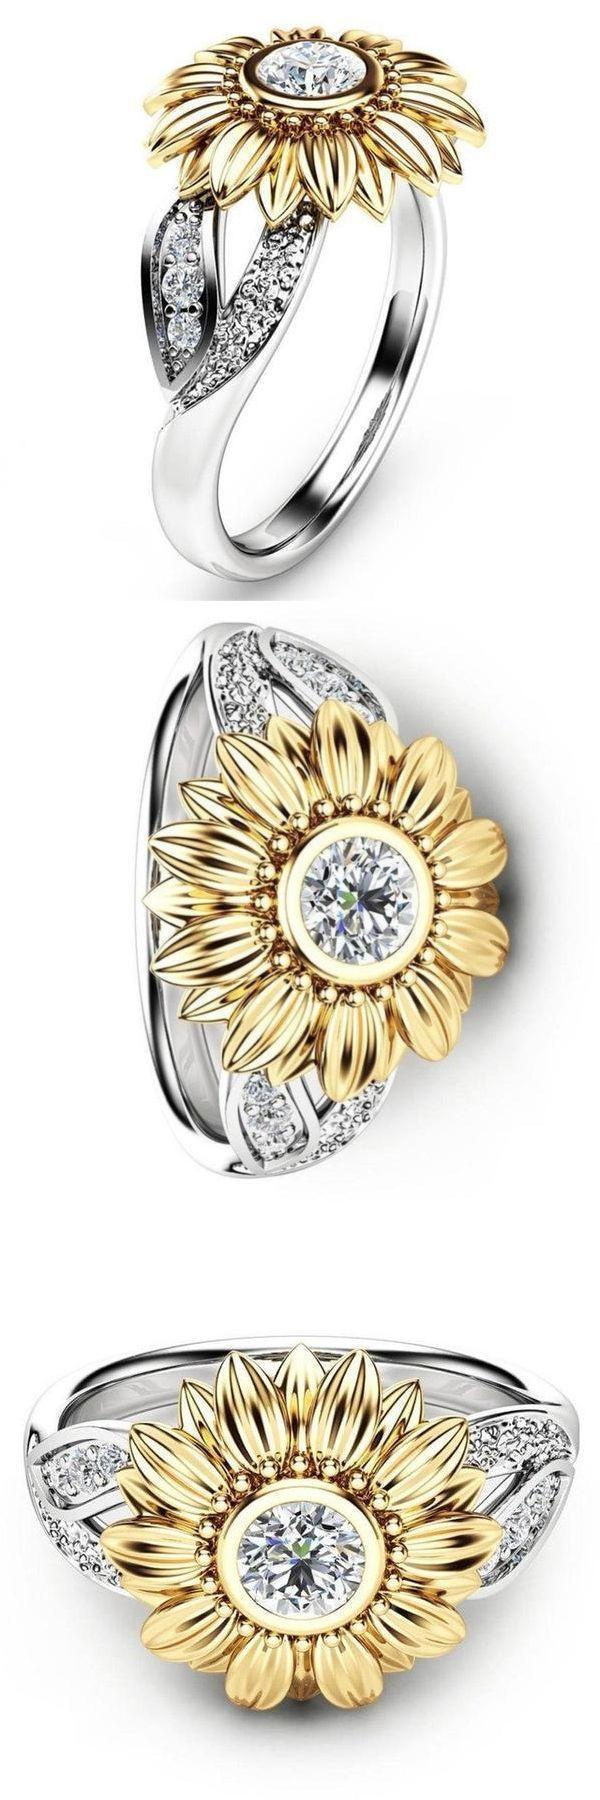 The Sunflower Ring in 2019 Sunflower ring, Sunflower